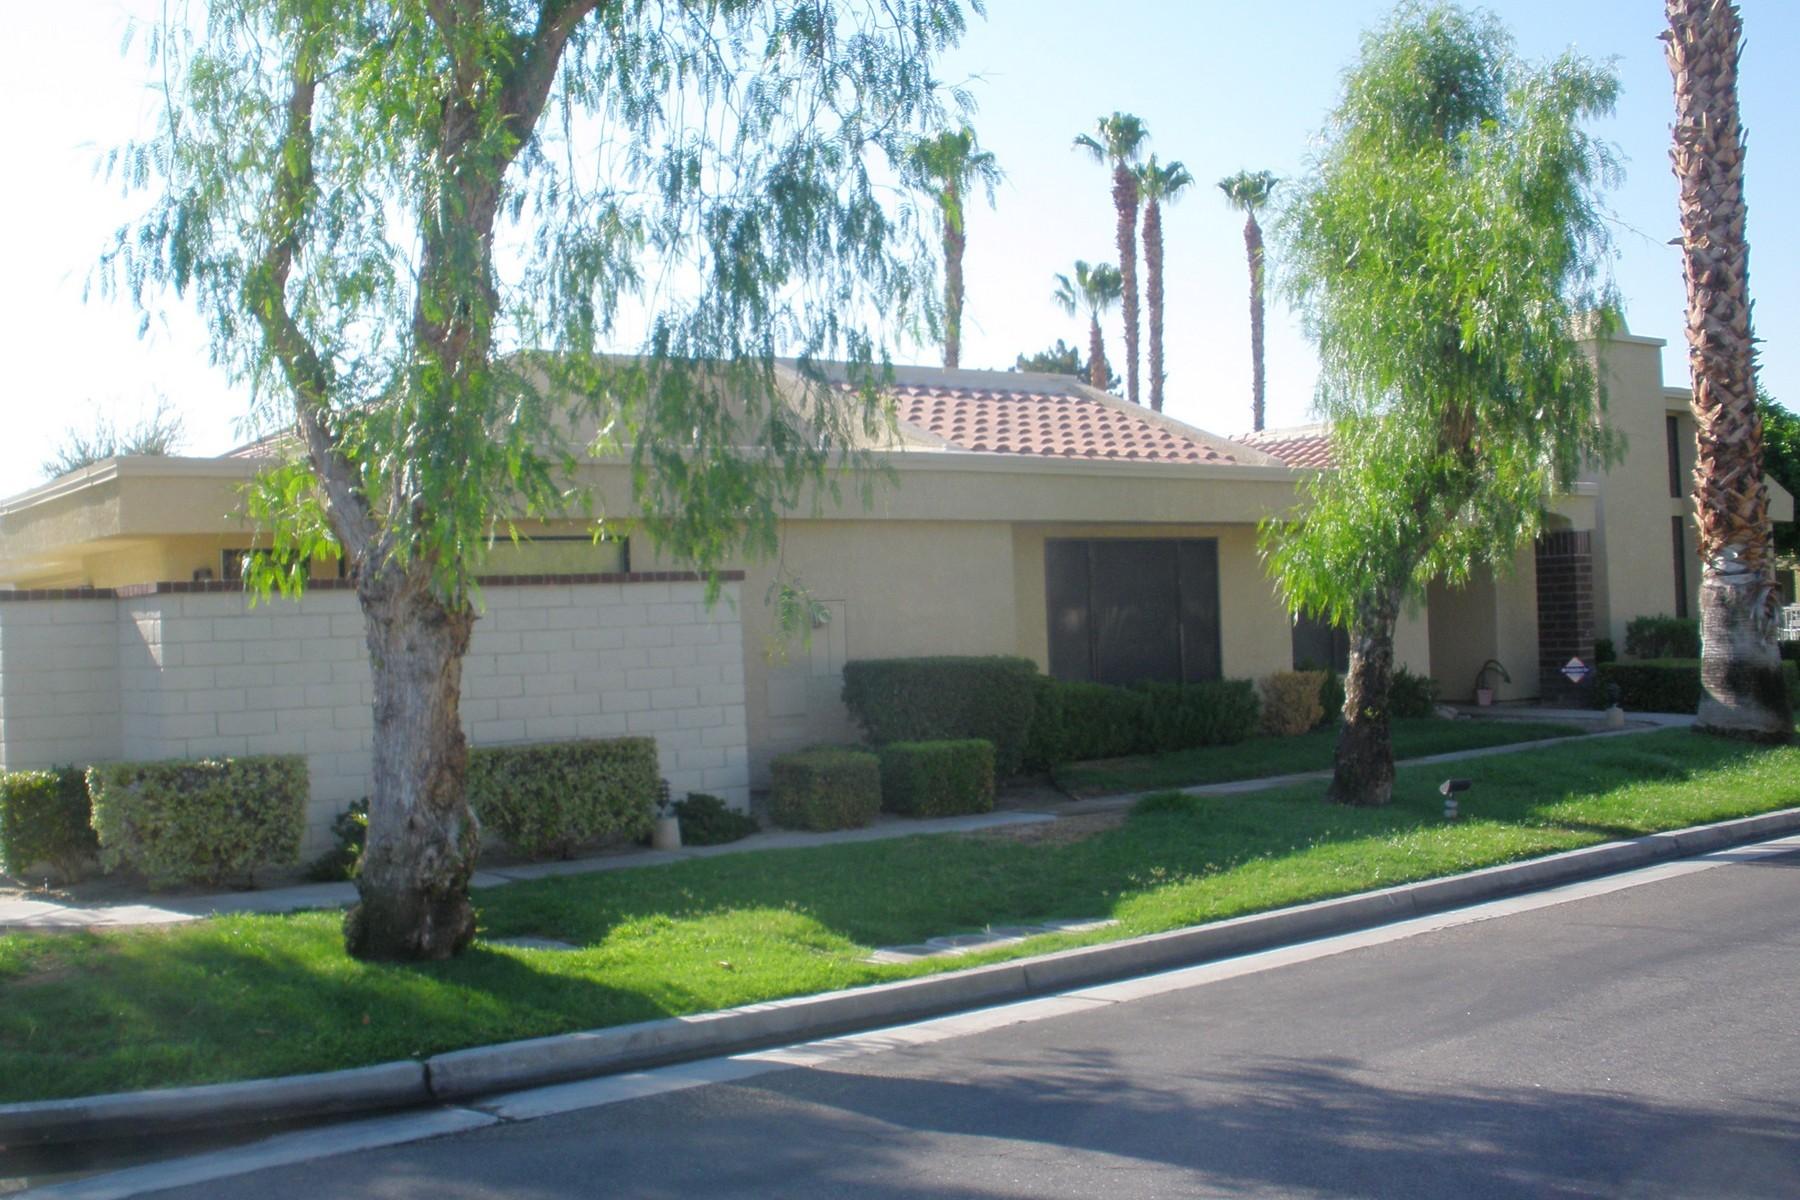 Condominium for Sale at 6733 Harwood Circle Palm Springs, California, 92264 United States